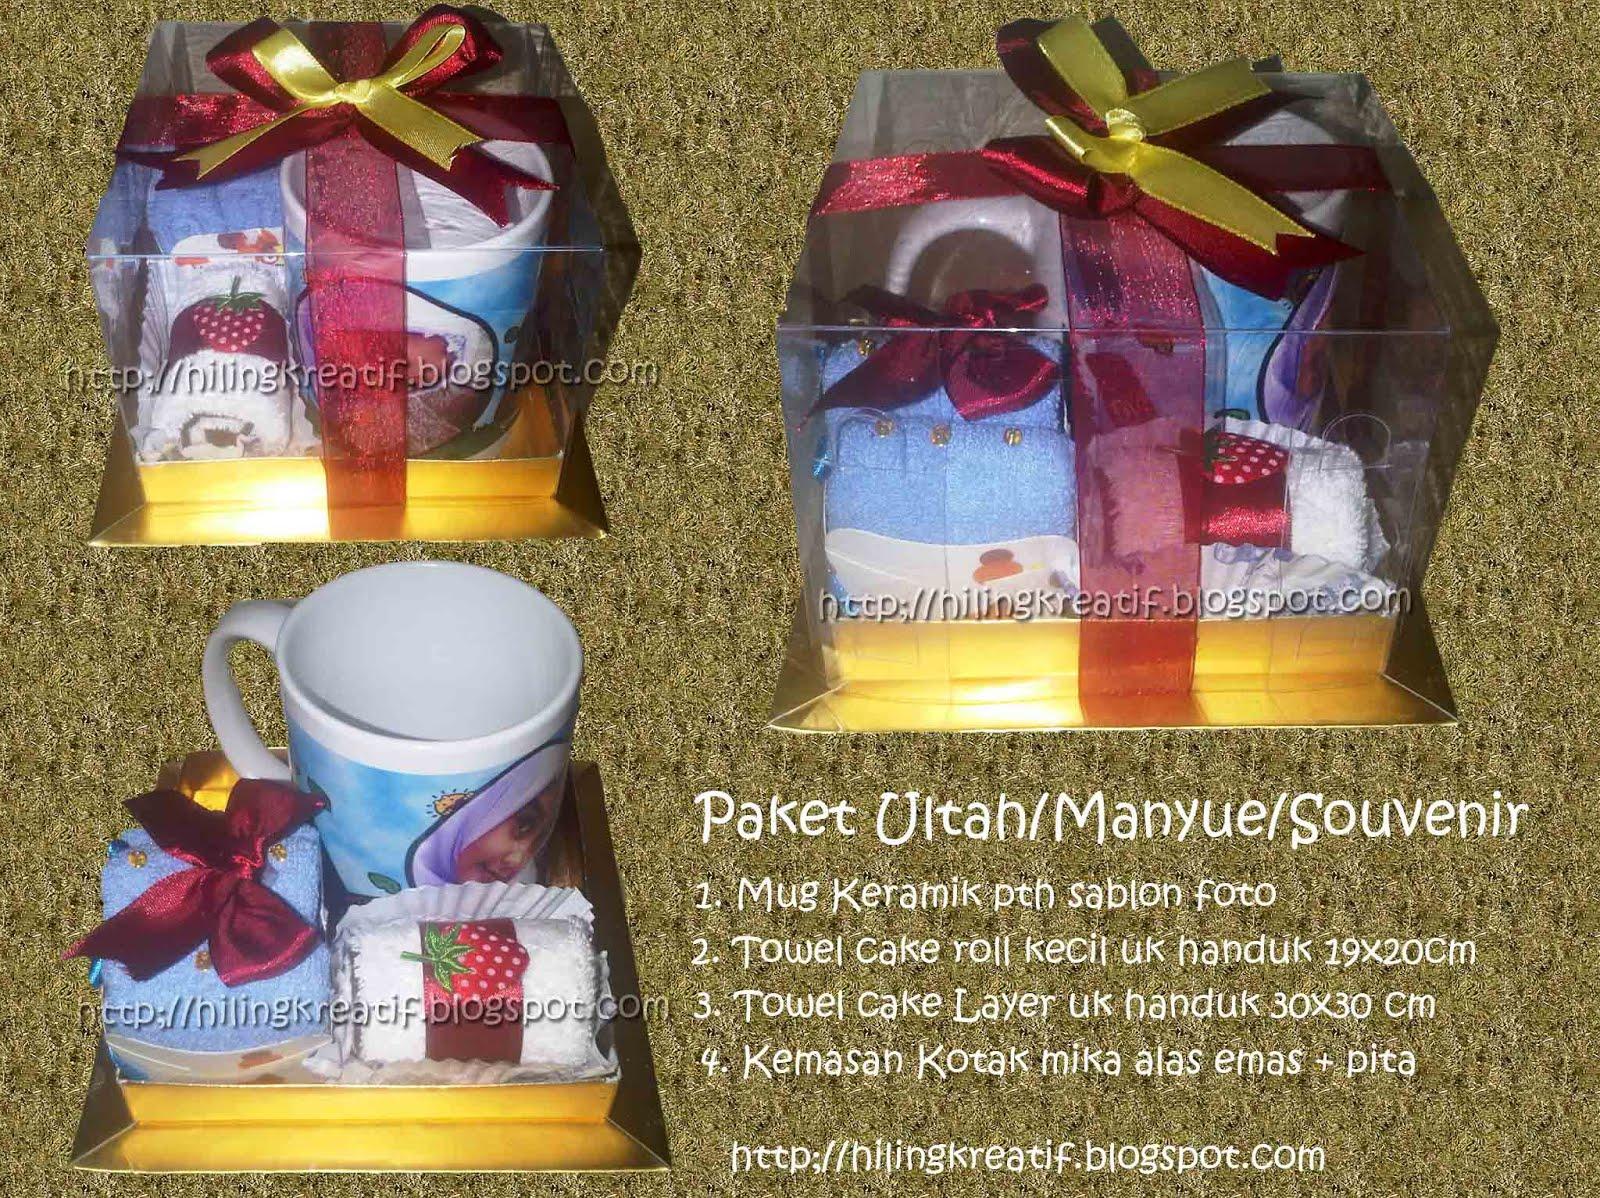 Paket Souvenir Ultah Souvenir Manyue Souvenir Anak Towel Cakemug